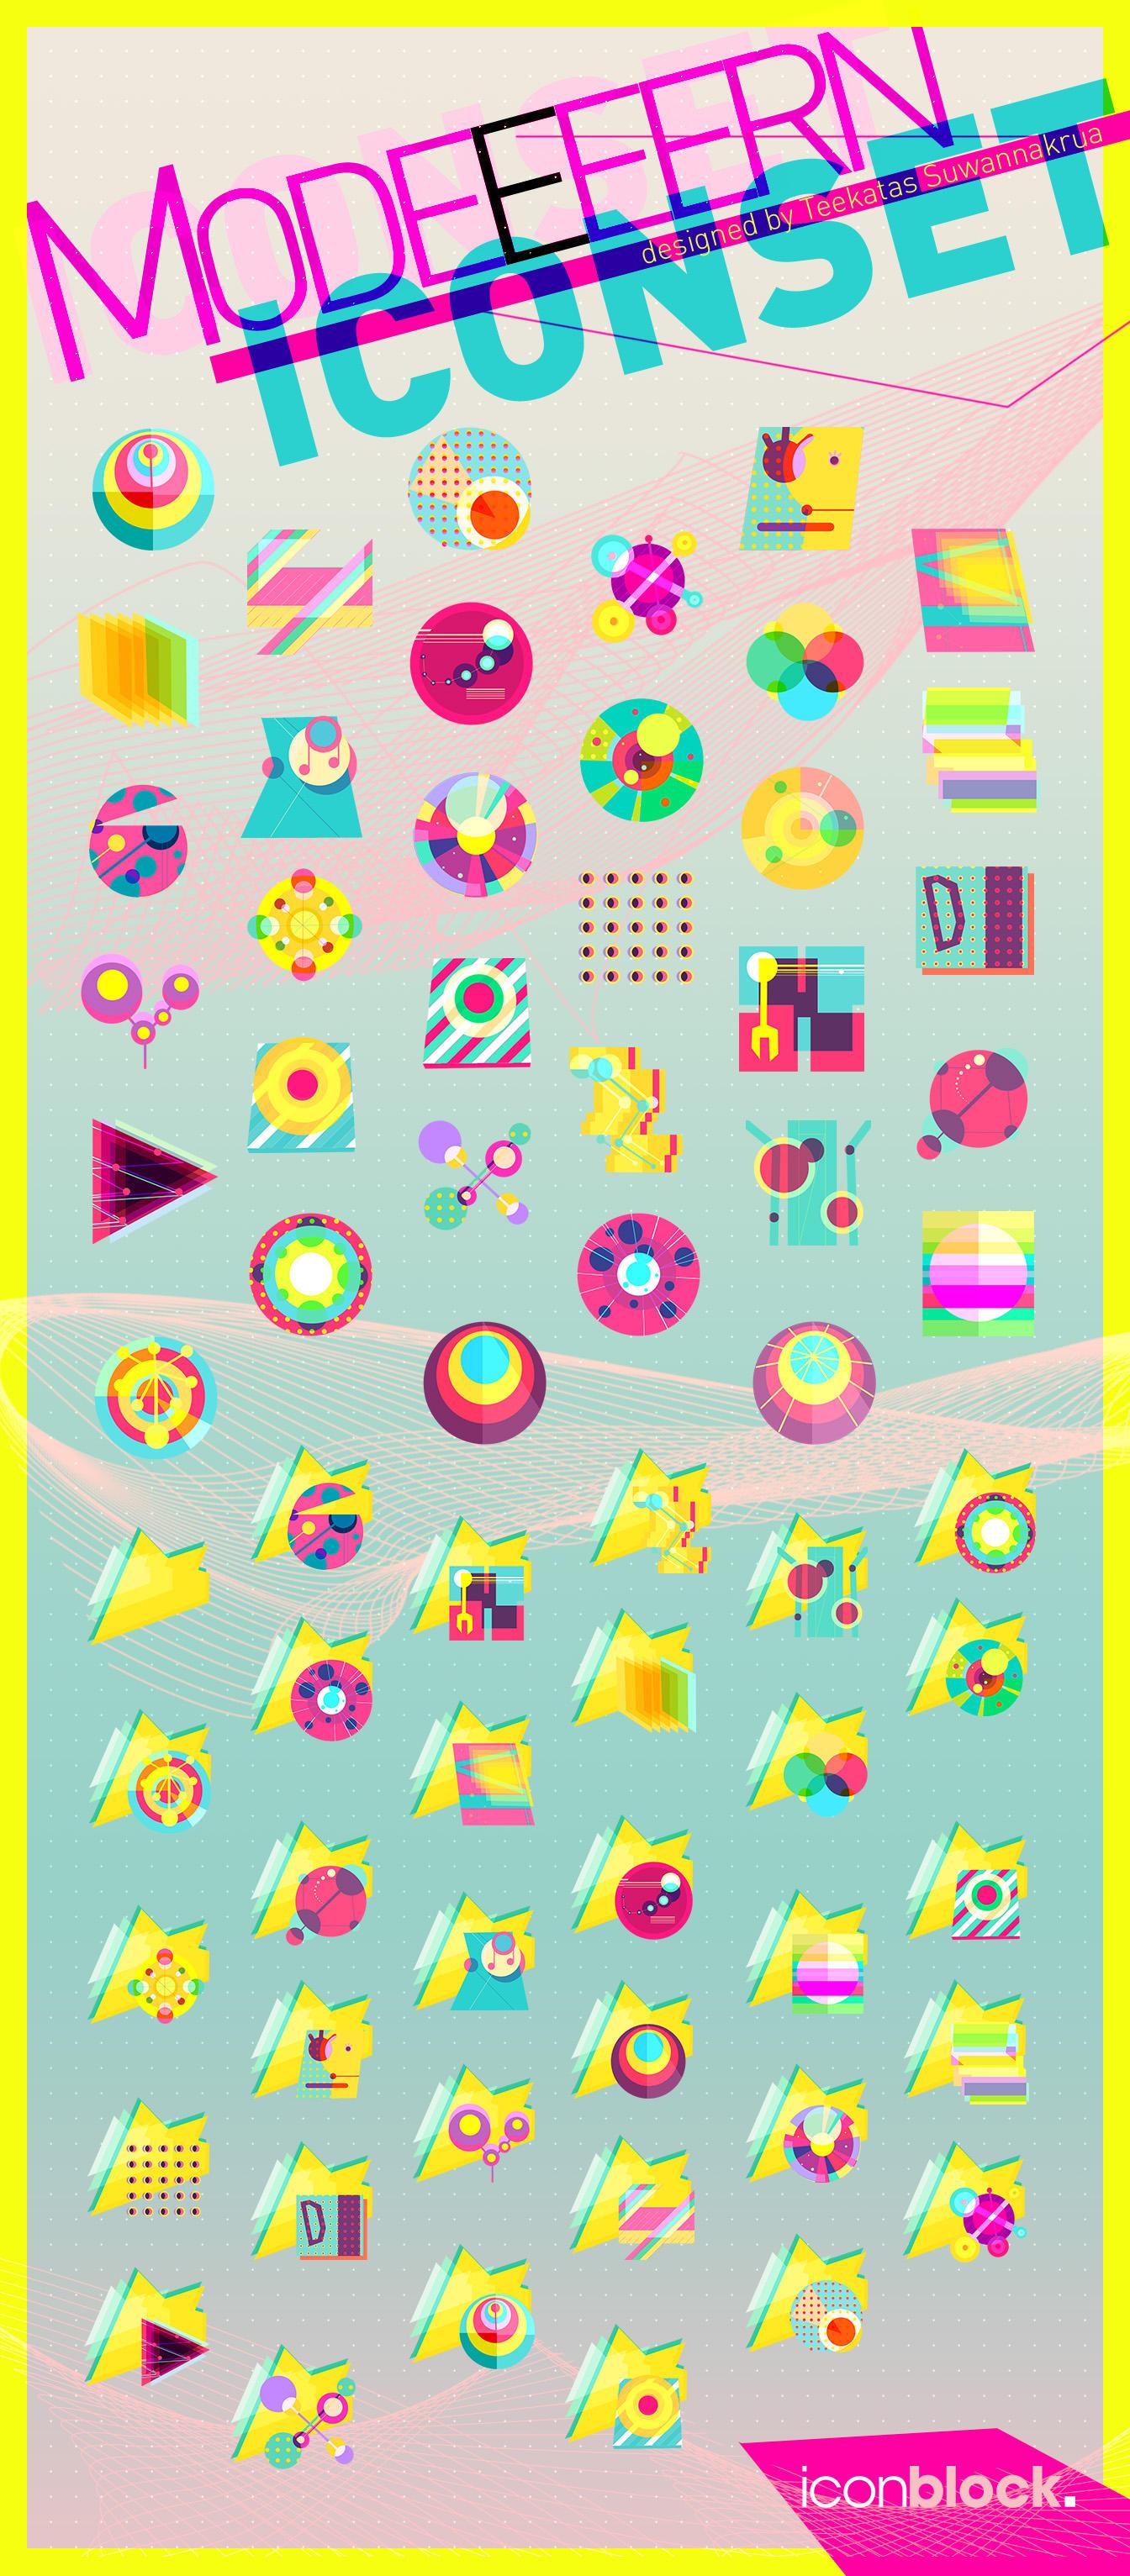 MODEEEERN Icon Set by Raindropmemory